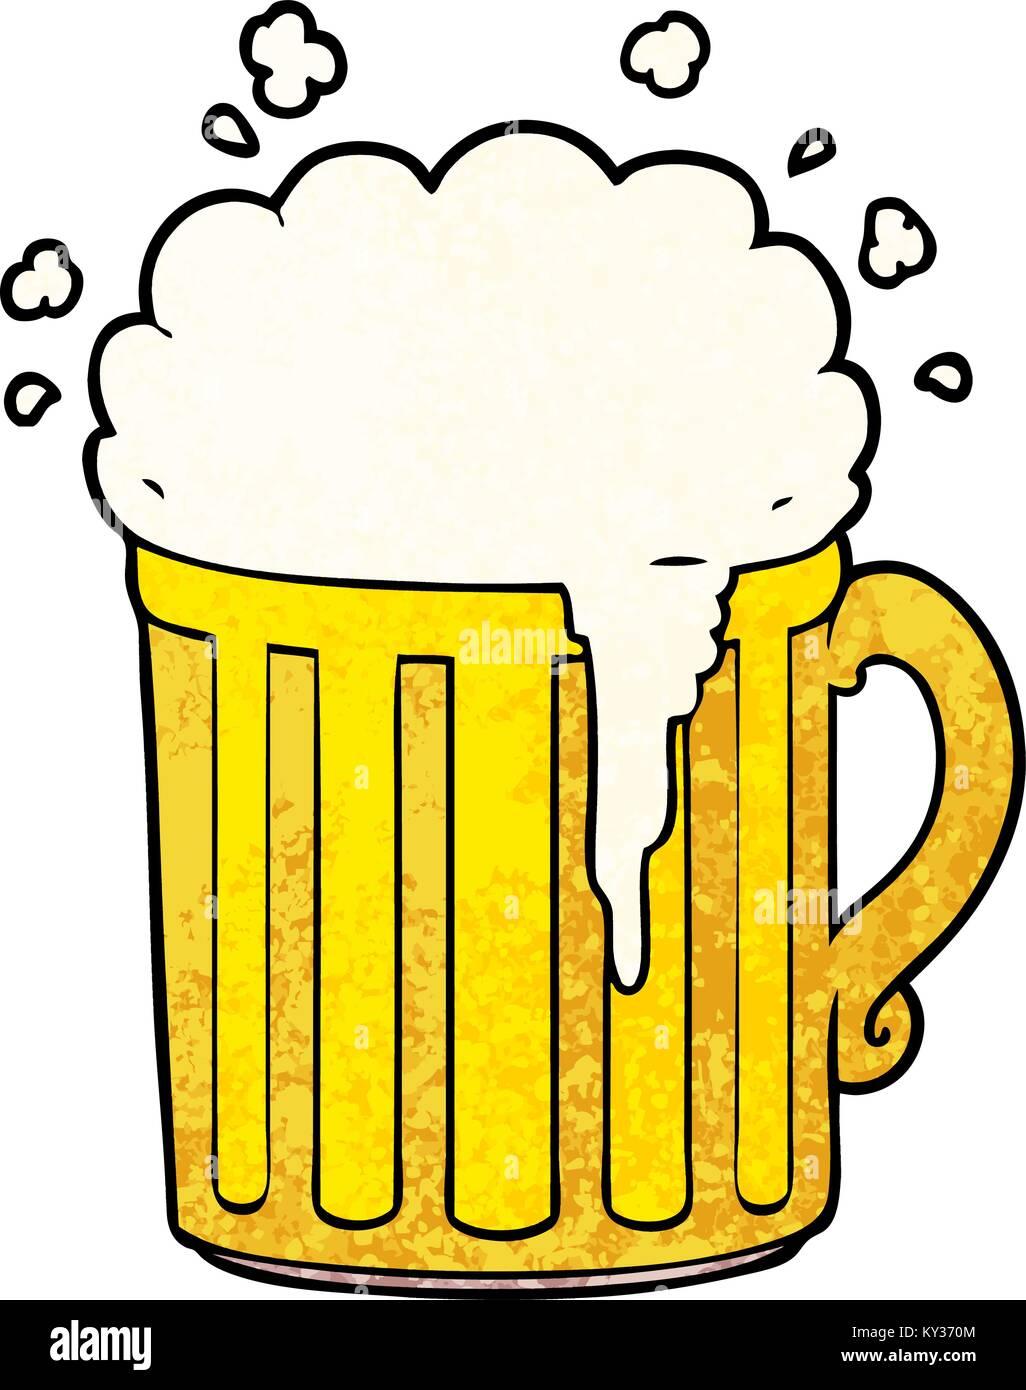 Image Result For Character Illustration Craft Beer